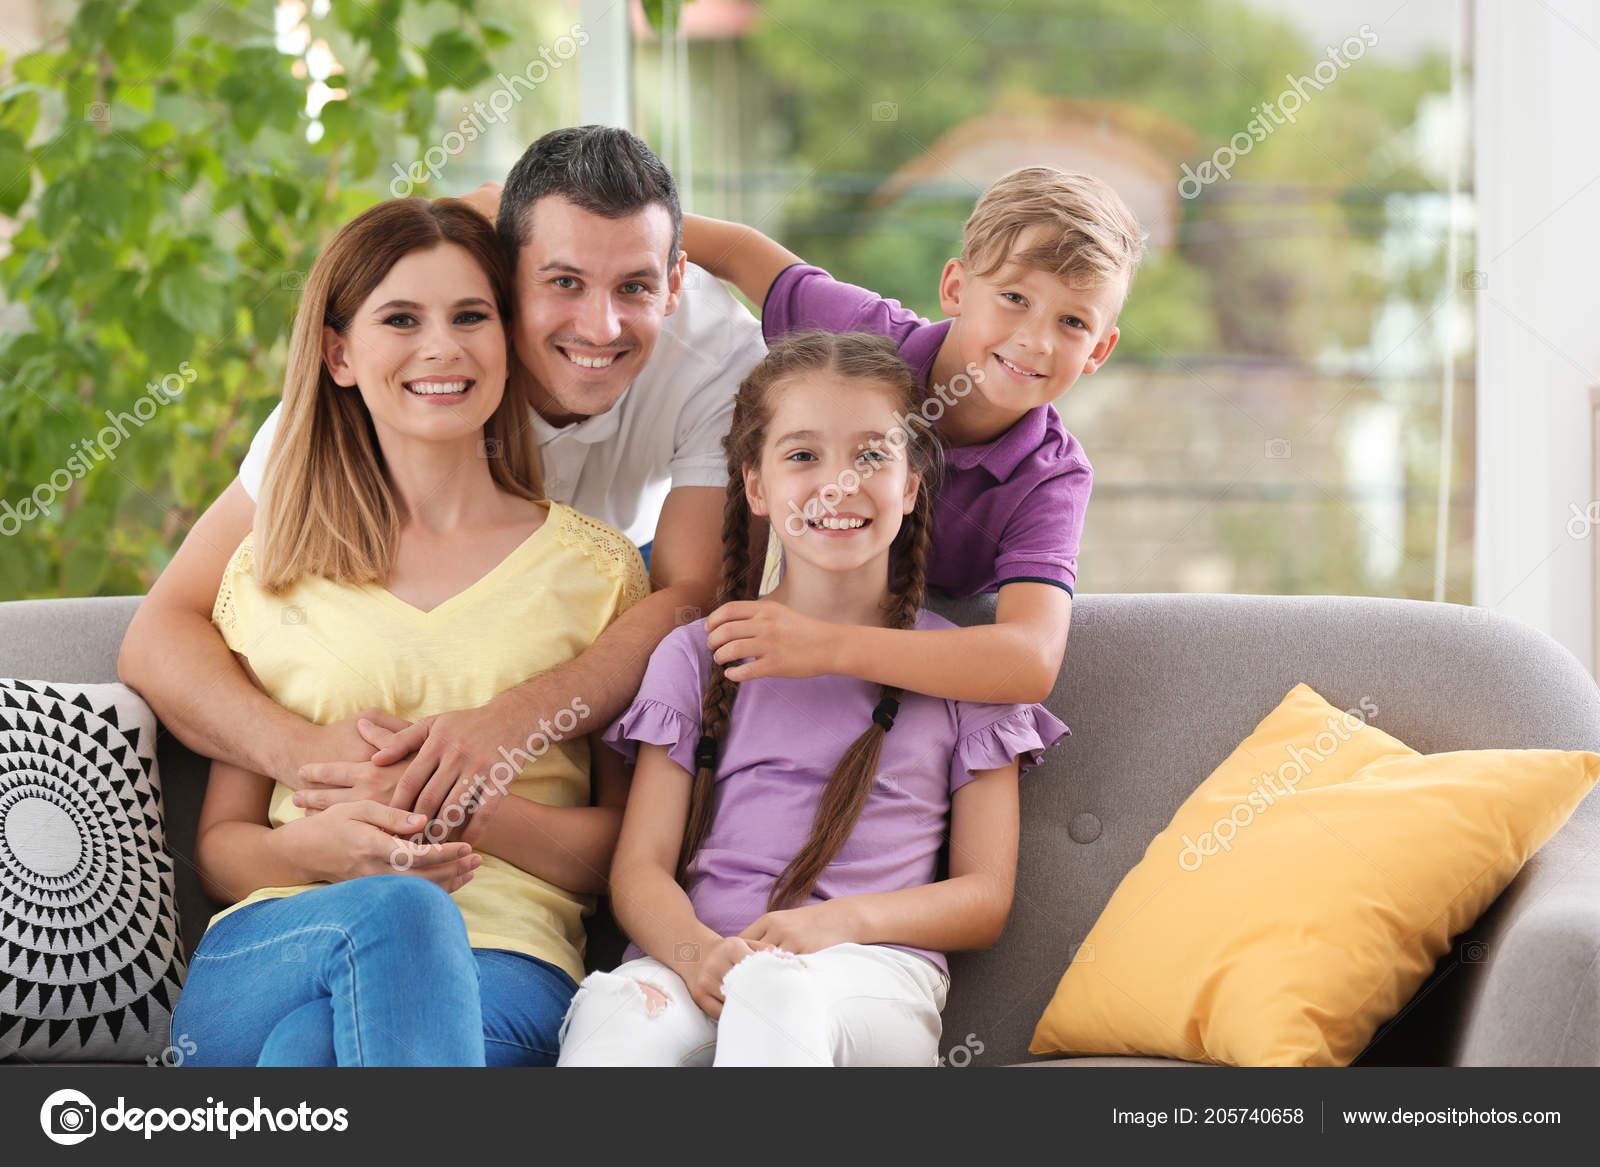 2b47b0ecf8b Ευτυχισμένη οικογένεια με χαριτωμένα παιδιά στο σπίτι — Εικόνα από  liudmilachernetska@gmail.com| ...